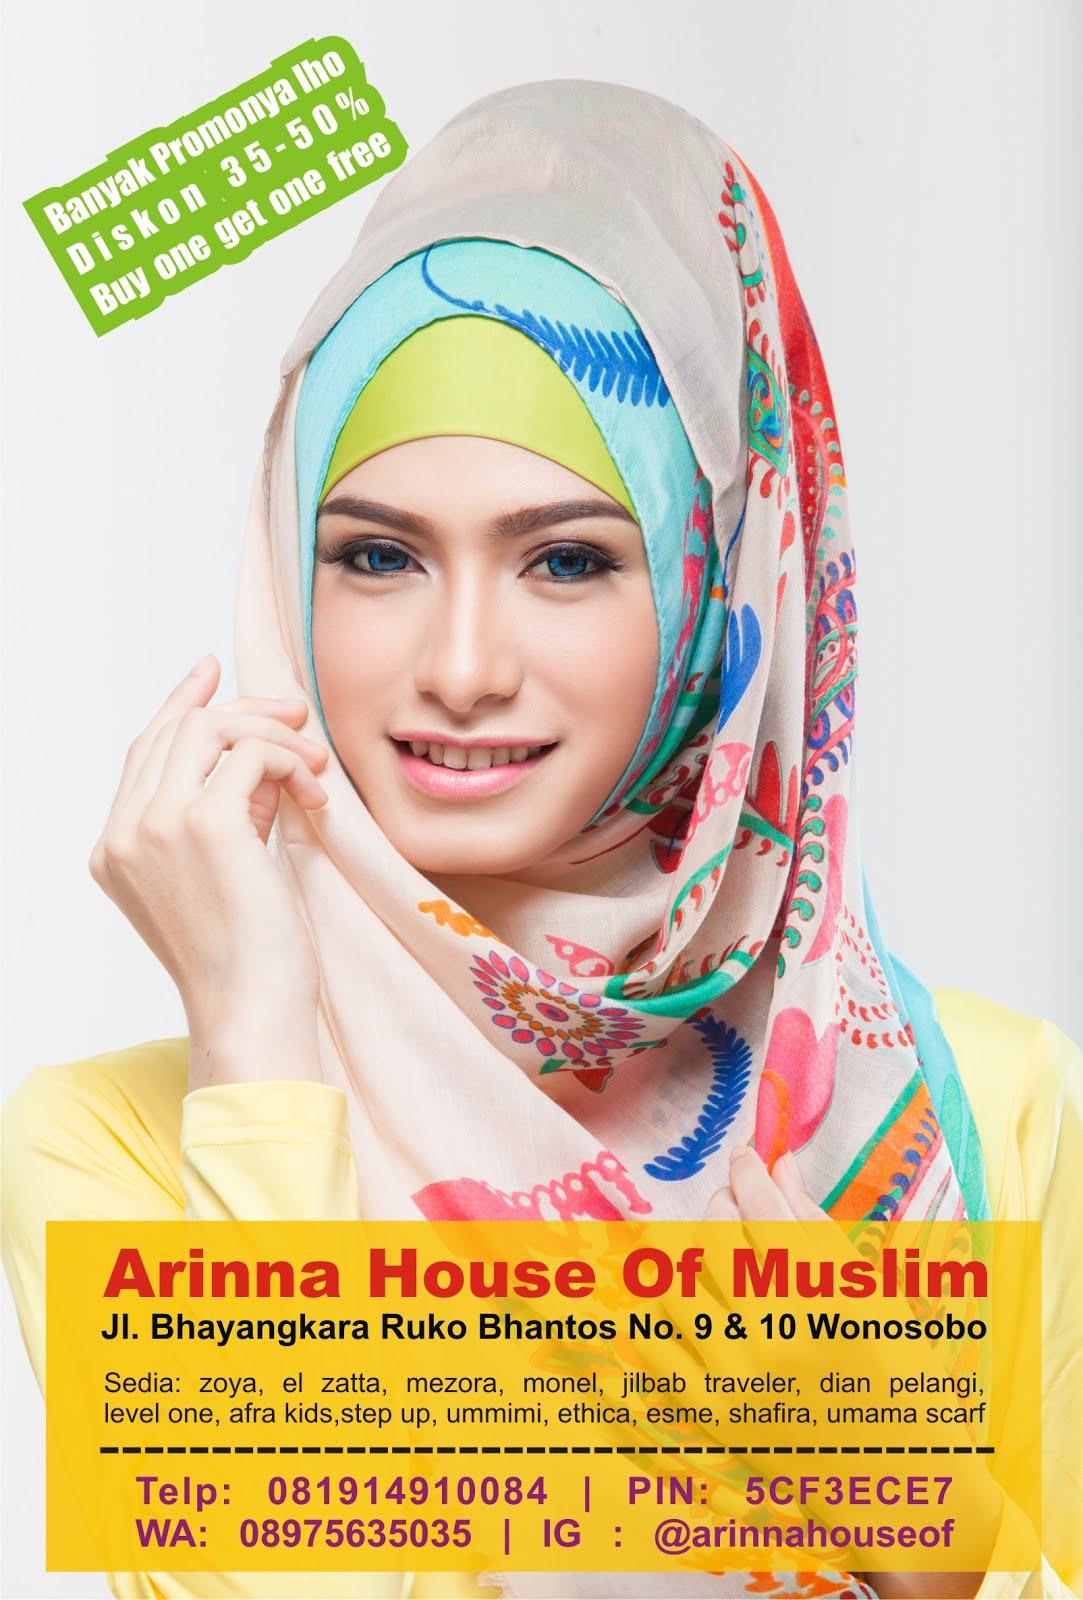 Arinna House Of Muslim Wonosobo